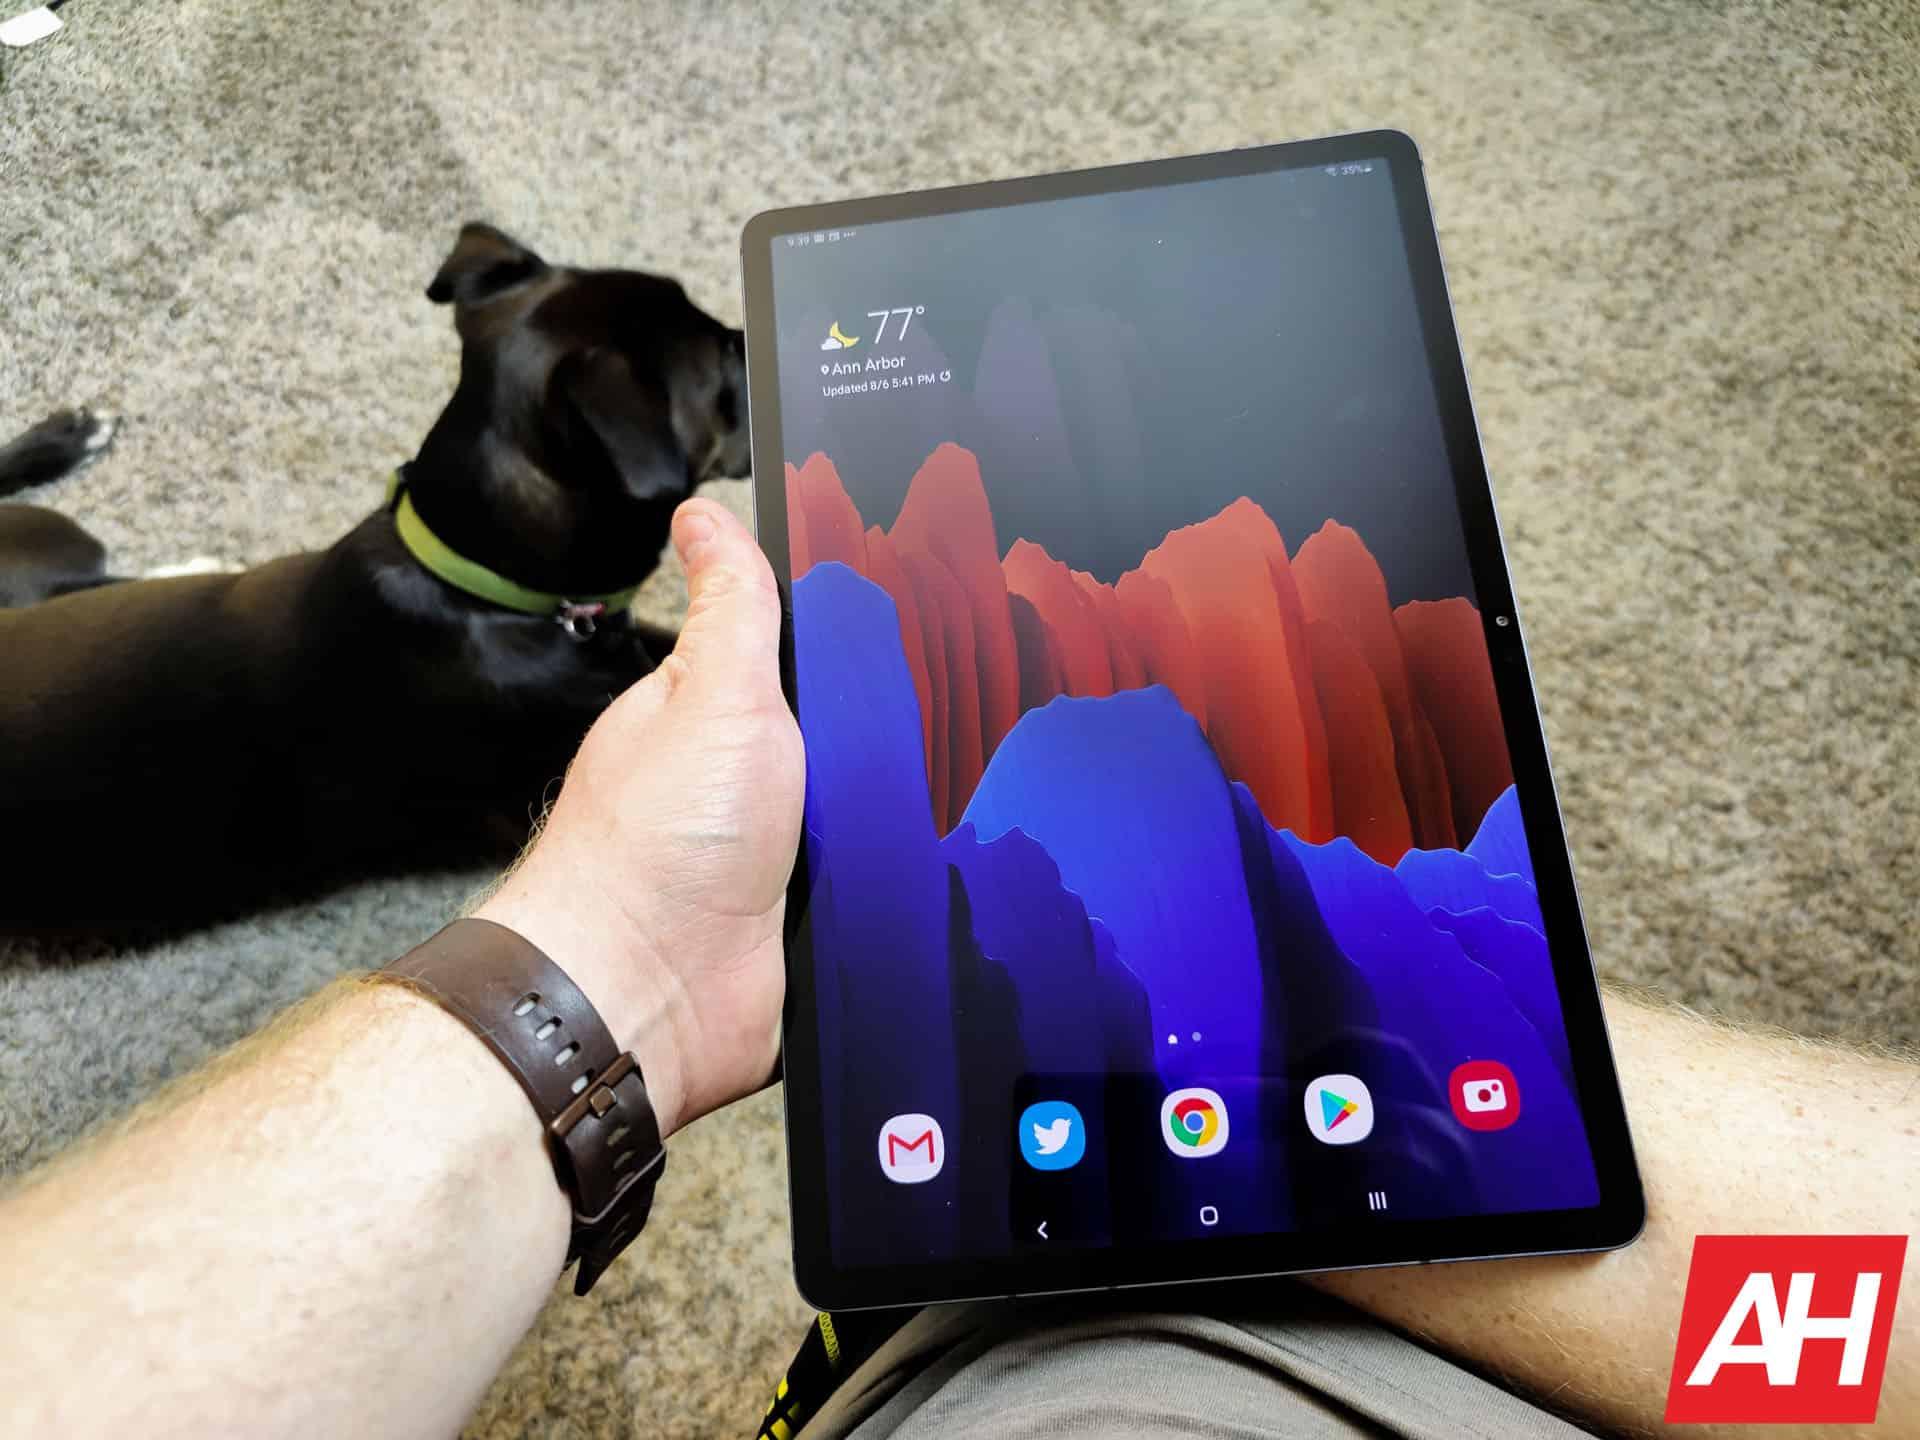 Samsung Galaxy Tab S7 Hands On AM AH 22